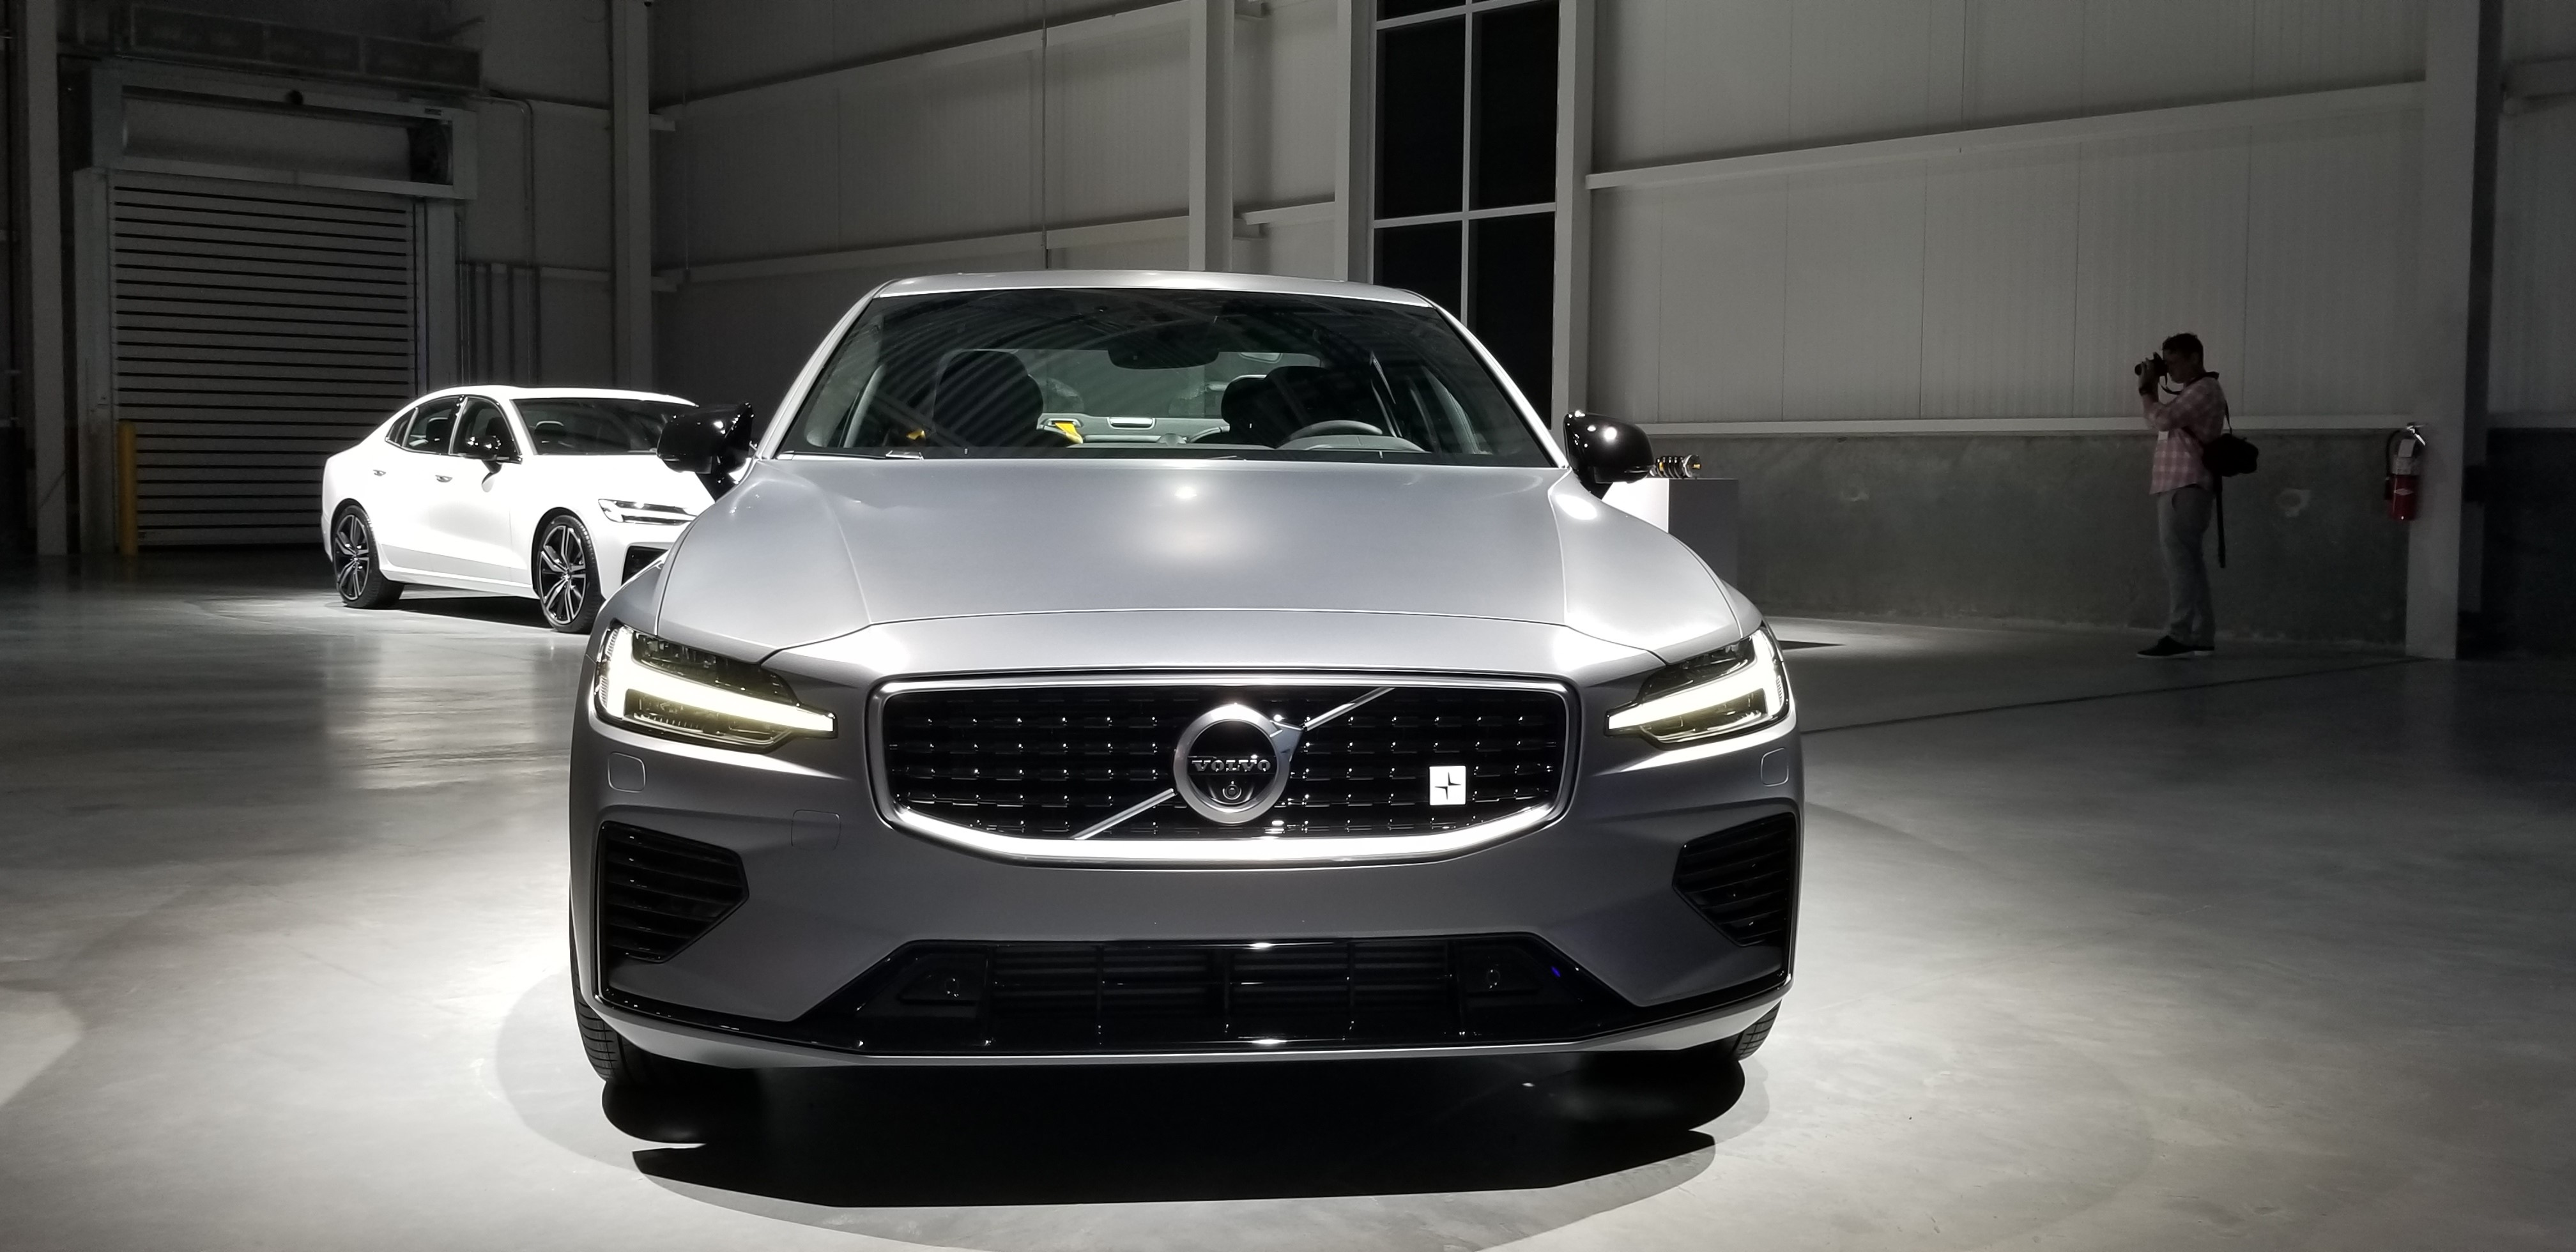 a4153d1fb15 Henry McMaster, Volvo CEO Hakan Samuelsson, Volvo Americas CEO Anders  Gustafsson, and Swedish Ambassador to the U.S. Karin Olofsdotter.